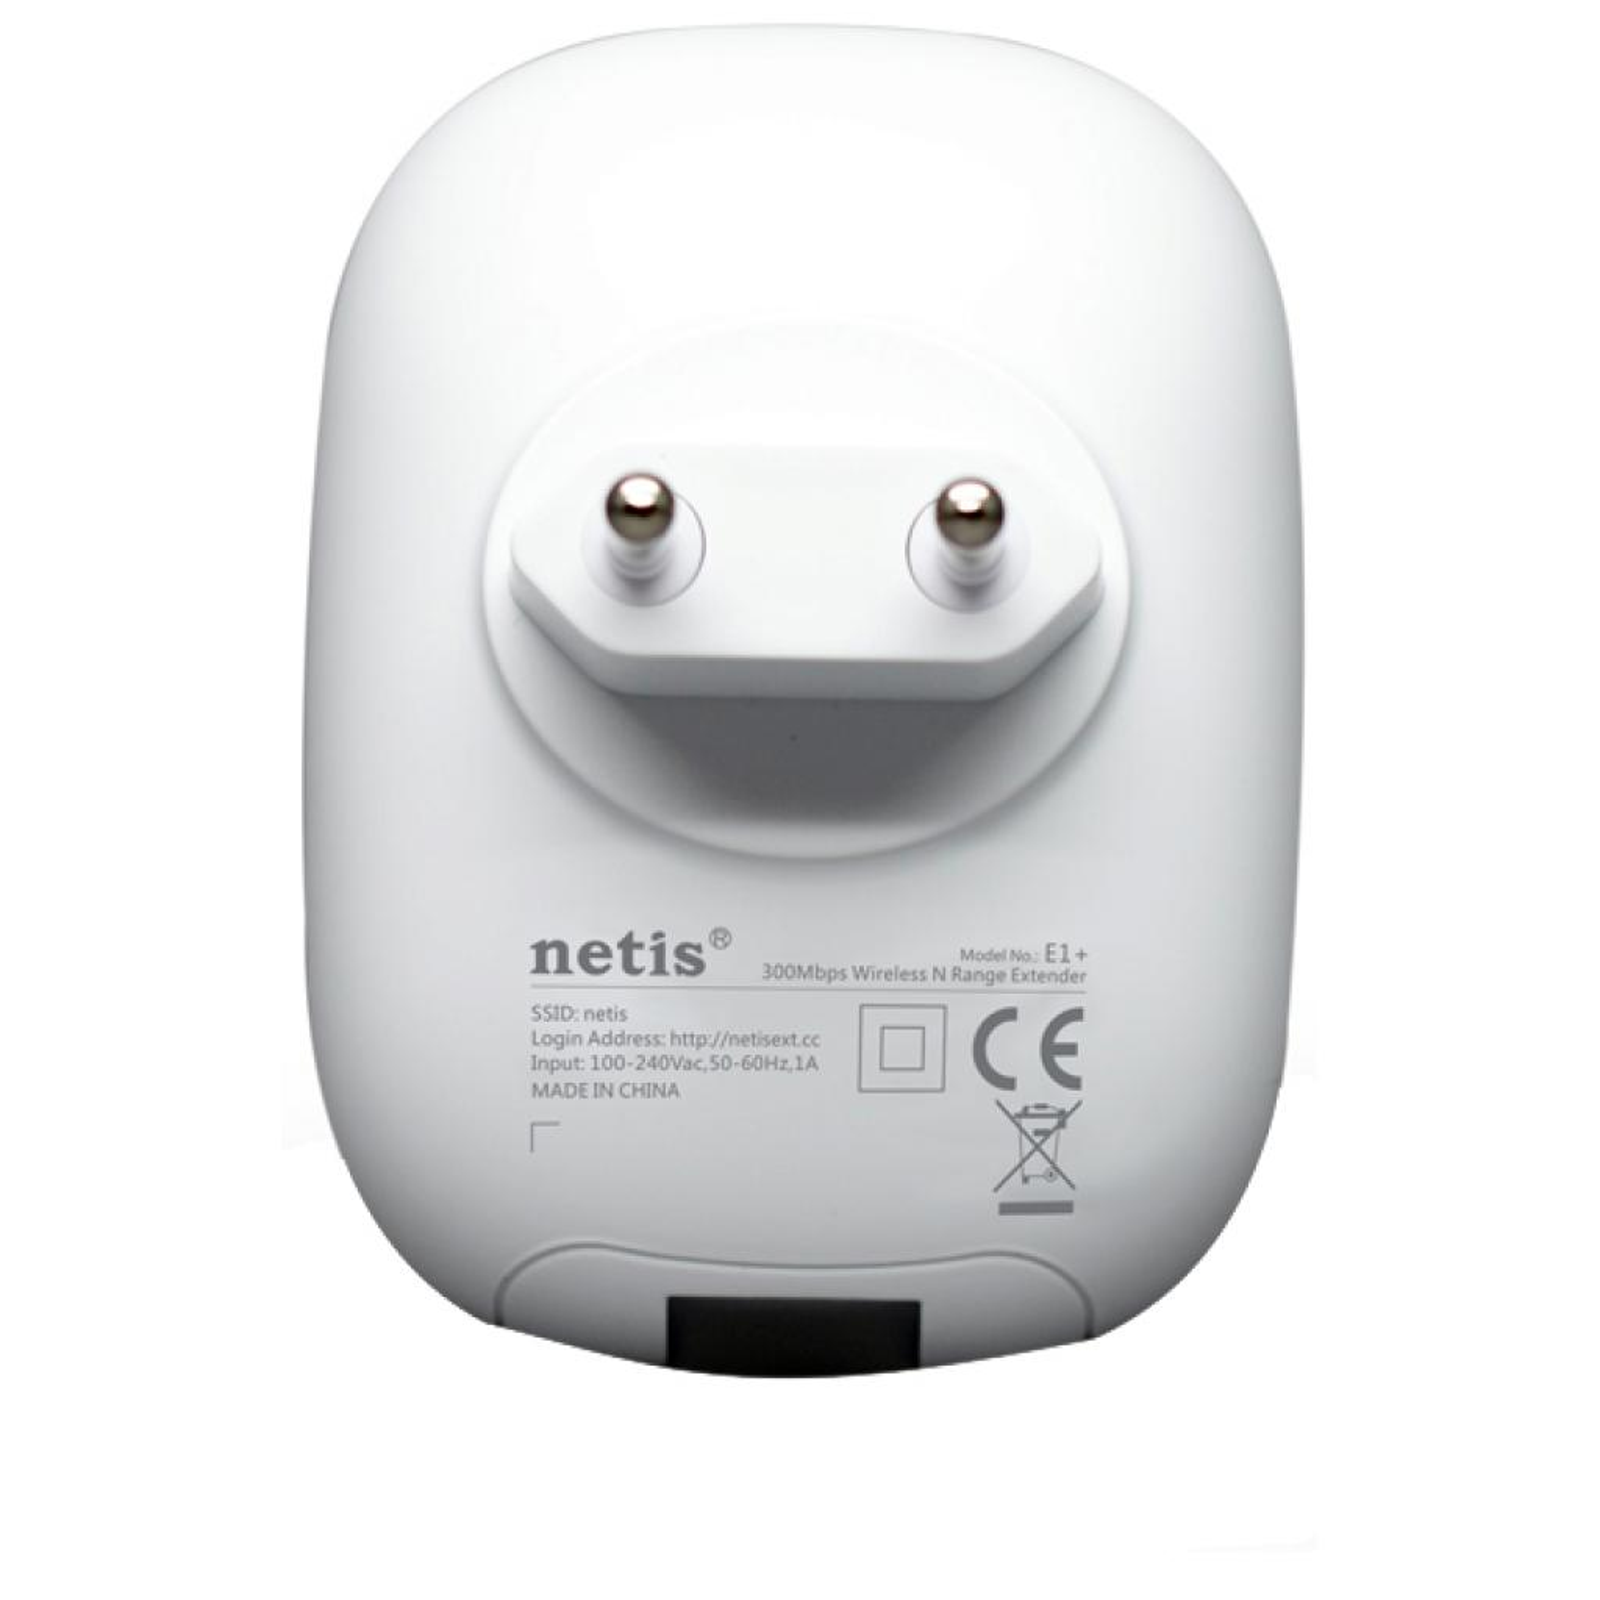 Ретранслятор Netis E1+ Blue изображение 2